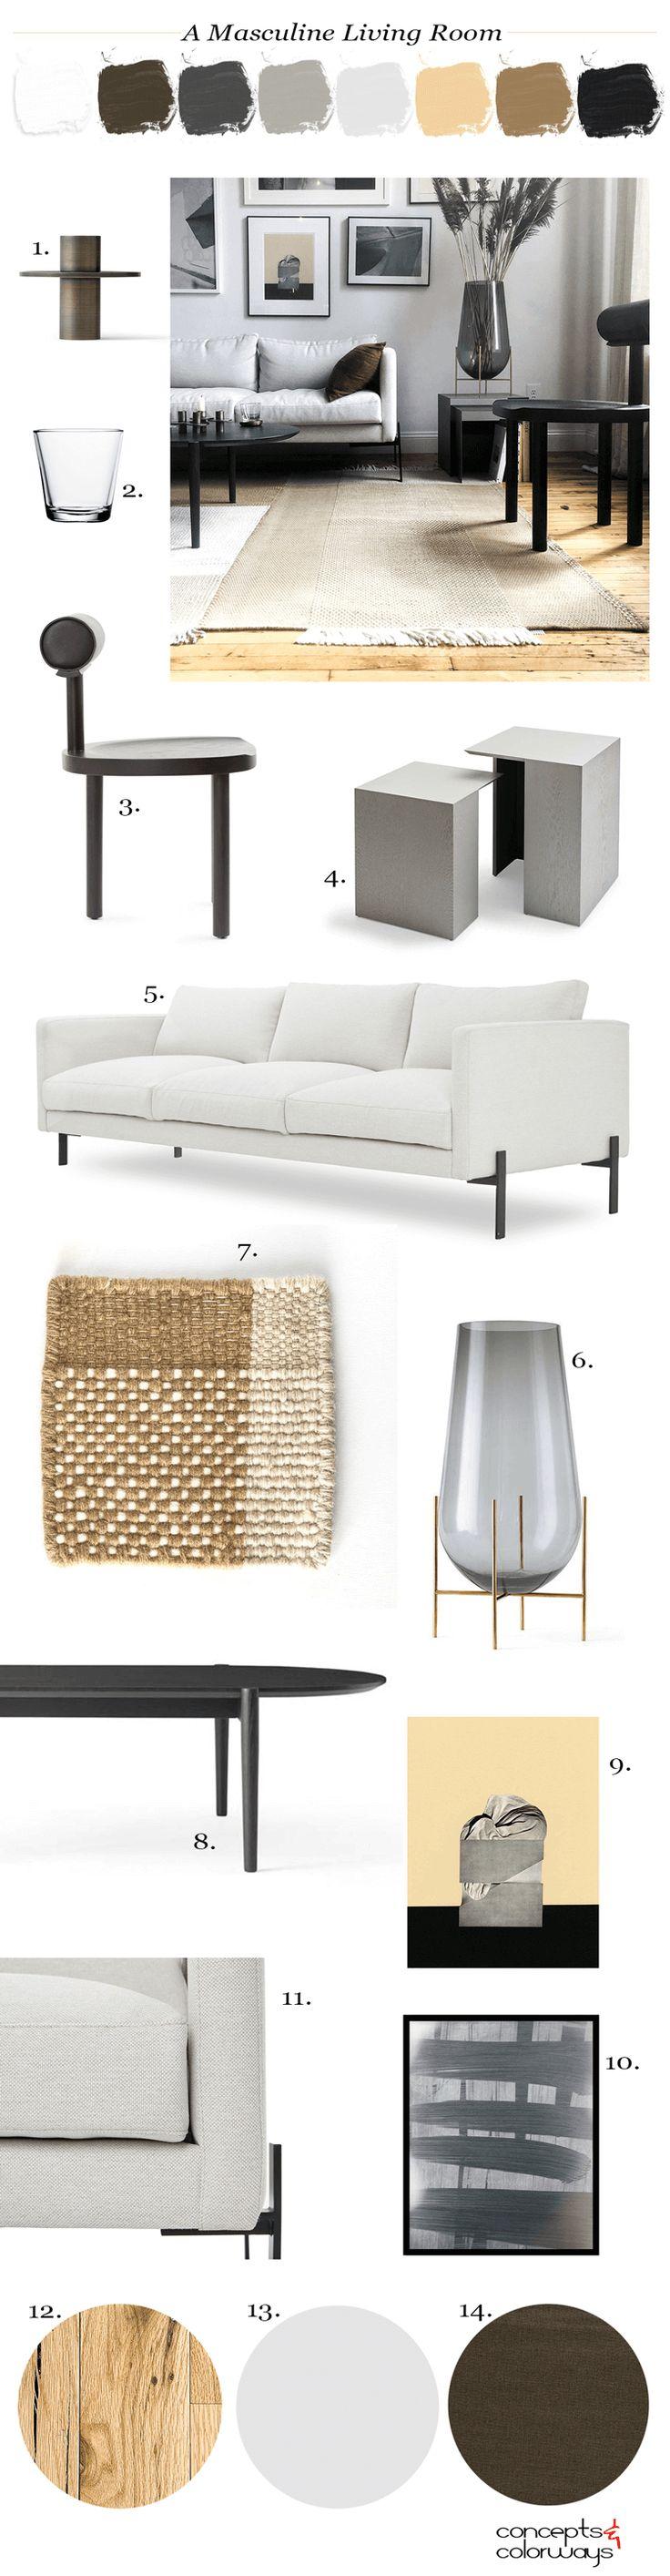 Best 25 Sofa side table ideas on Pinterest